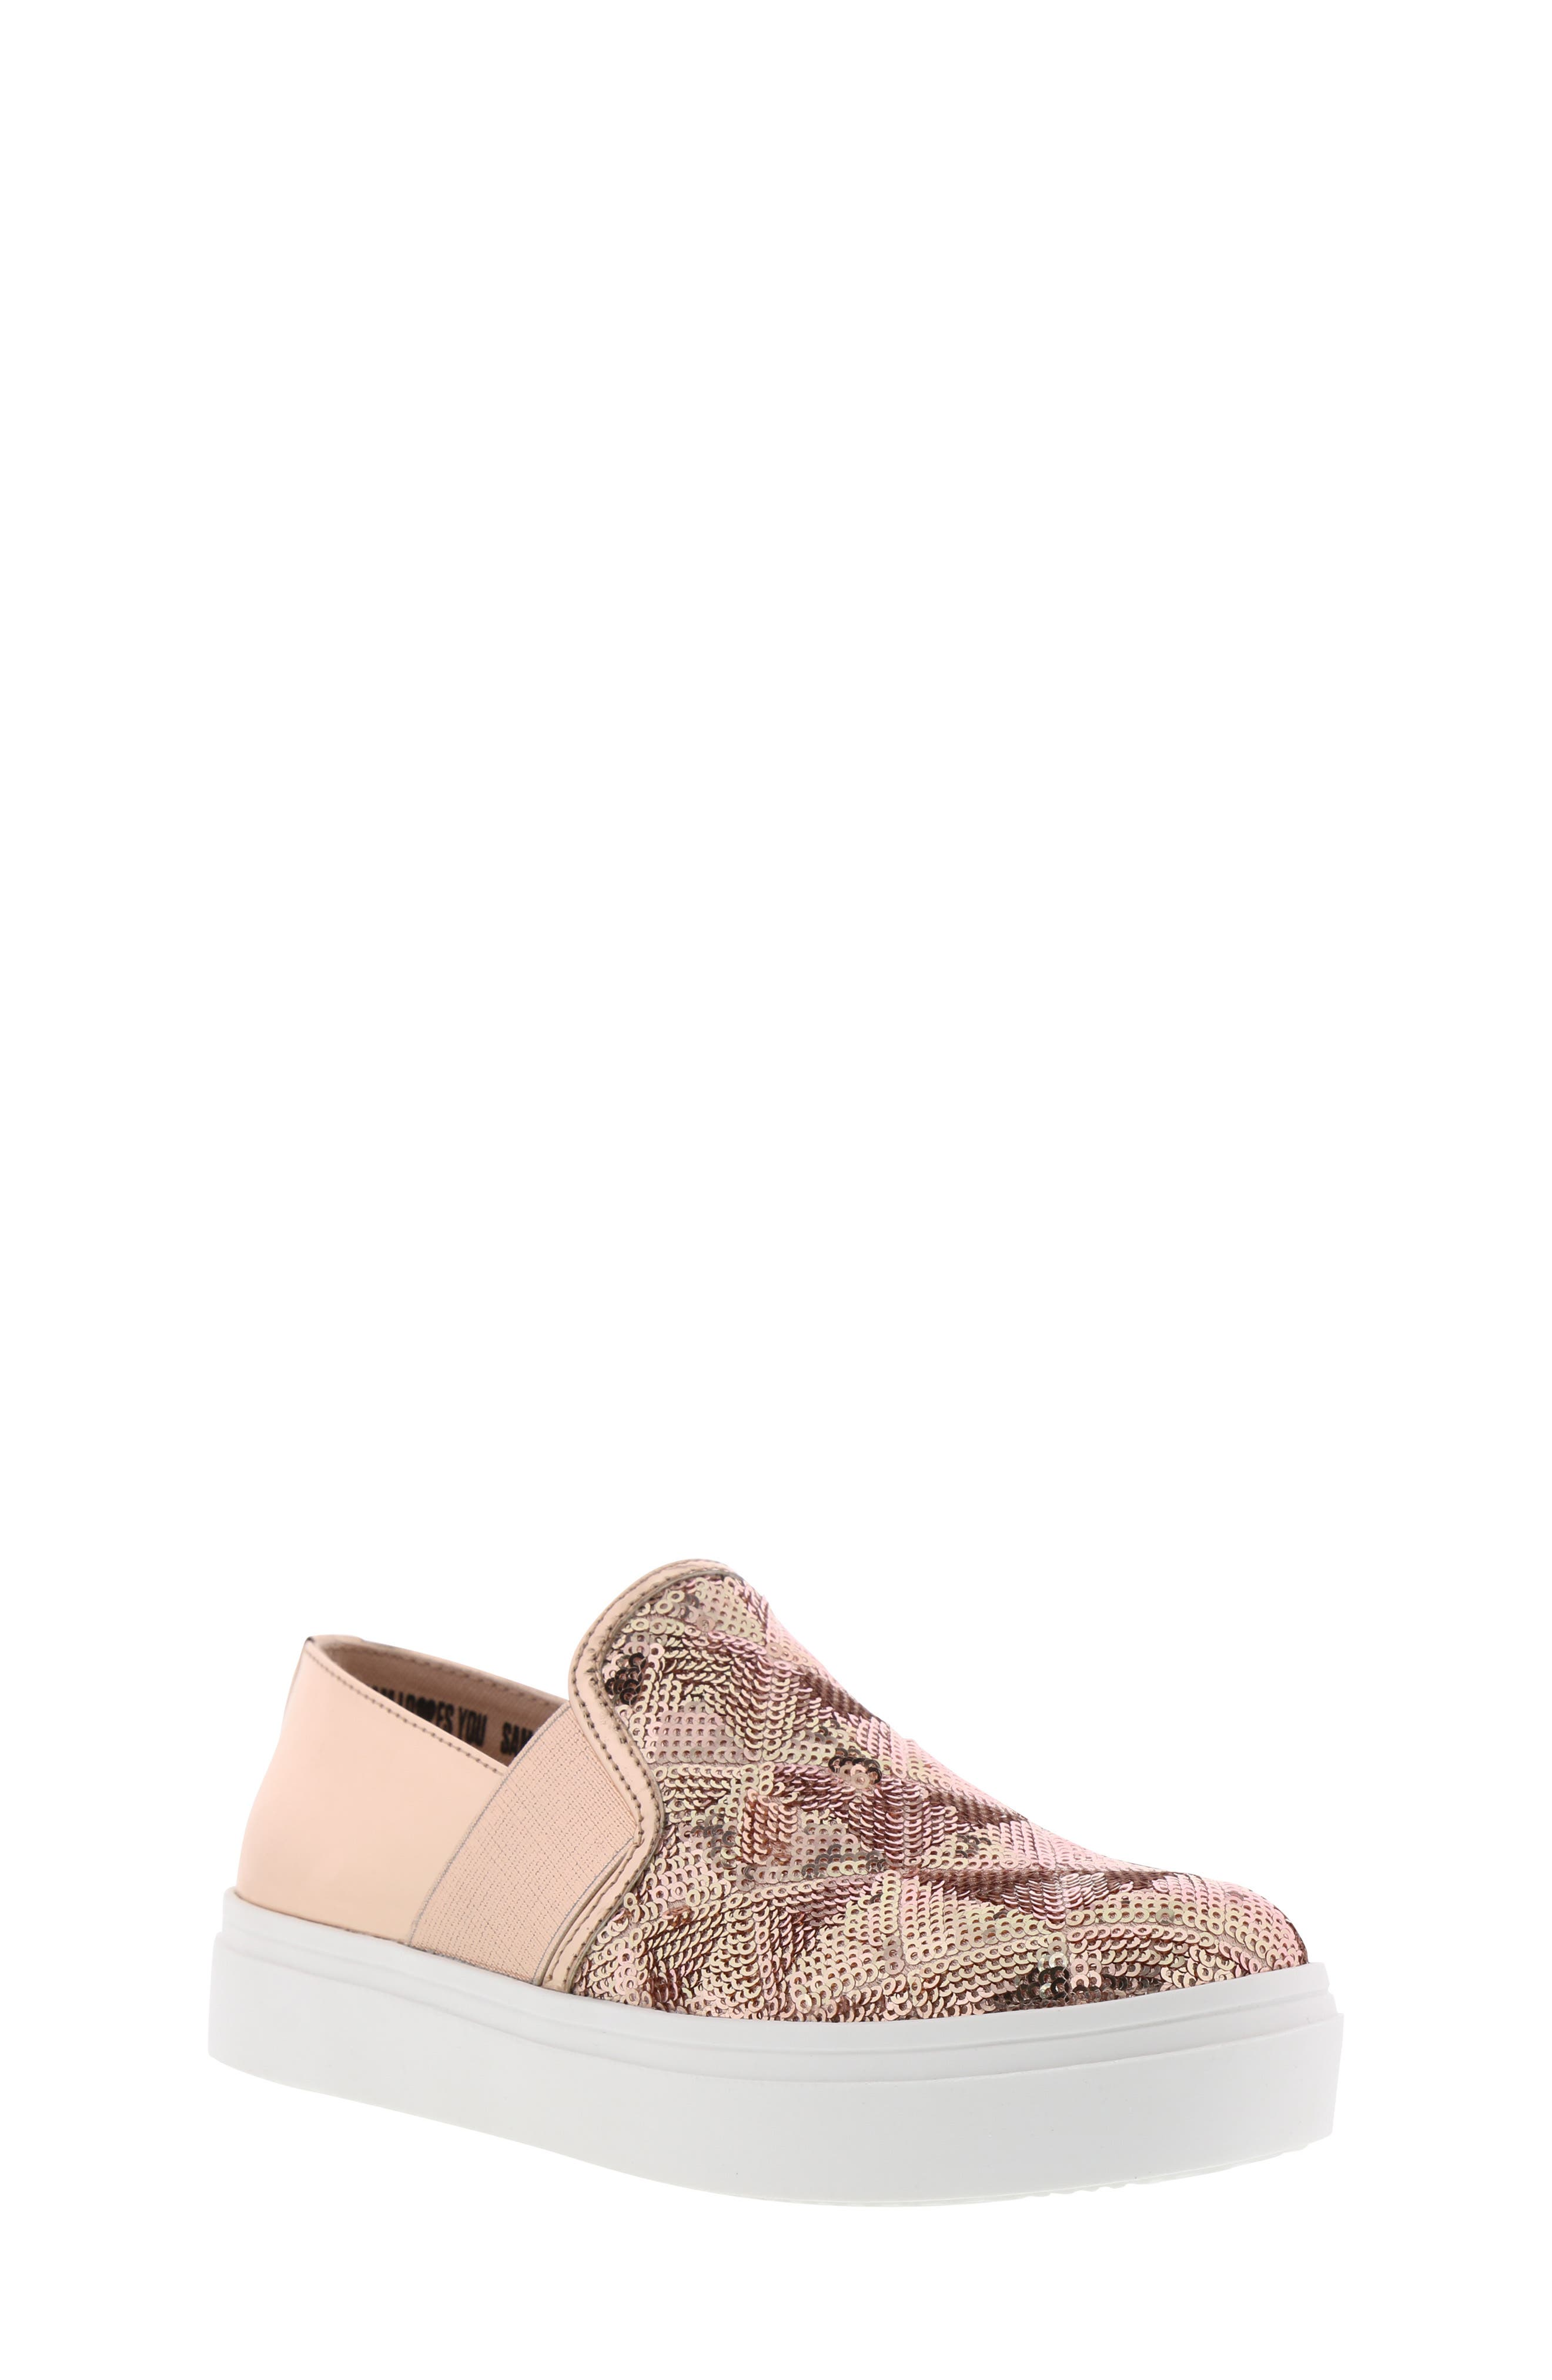 Sheena Pam Sequin Sneaker,                         Main,                         color, ROSE GOLD